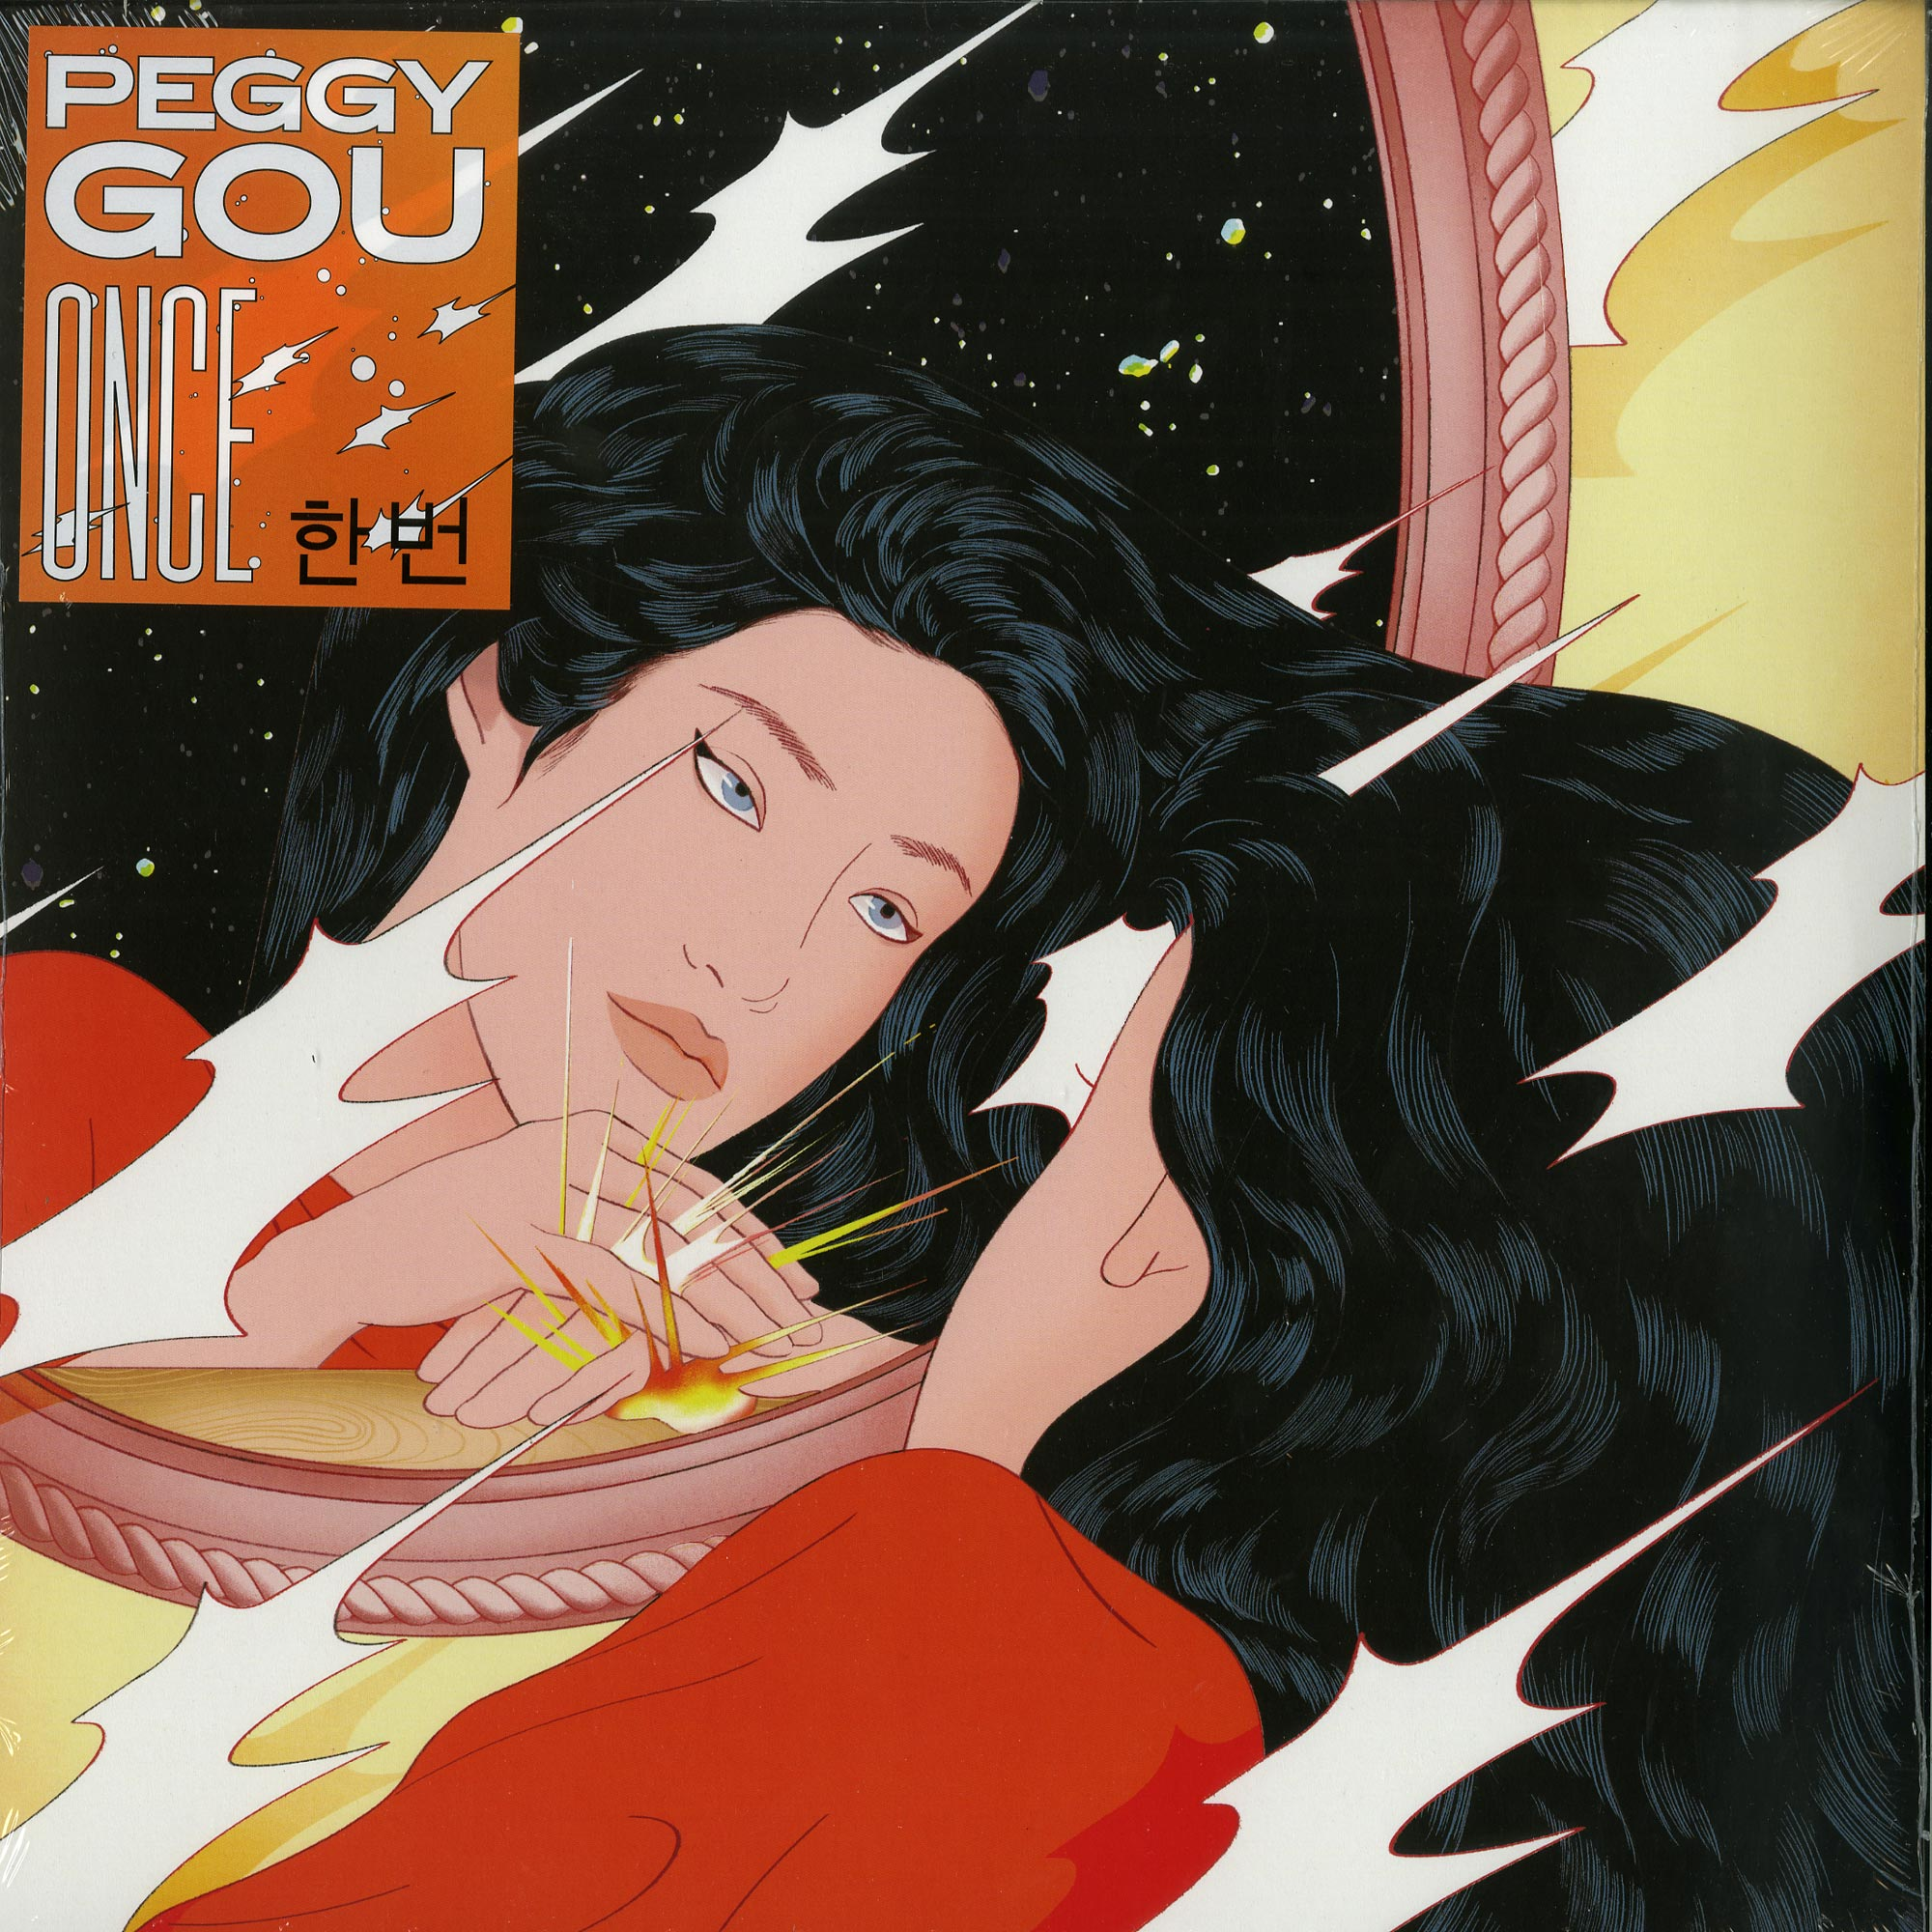 Peggy Gou - ONCE